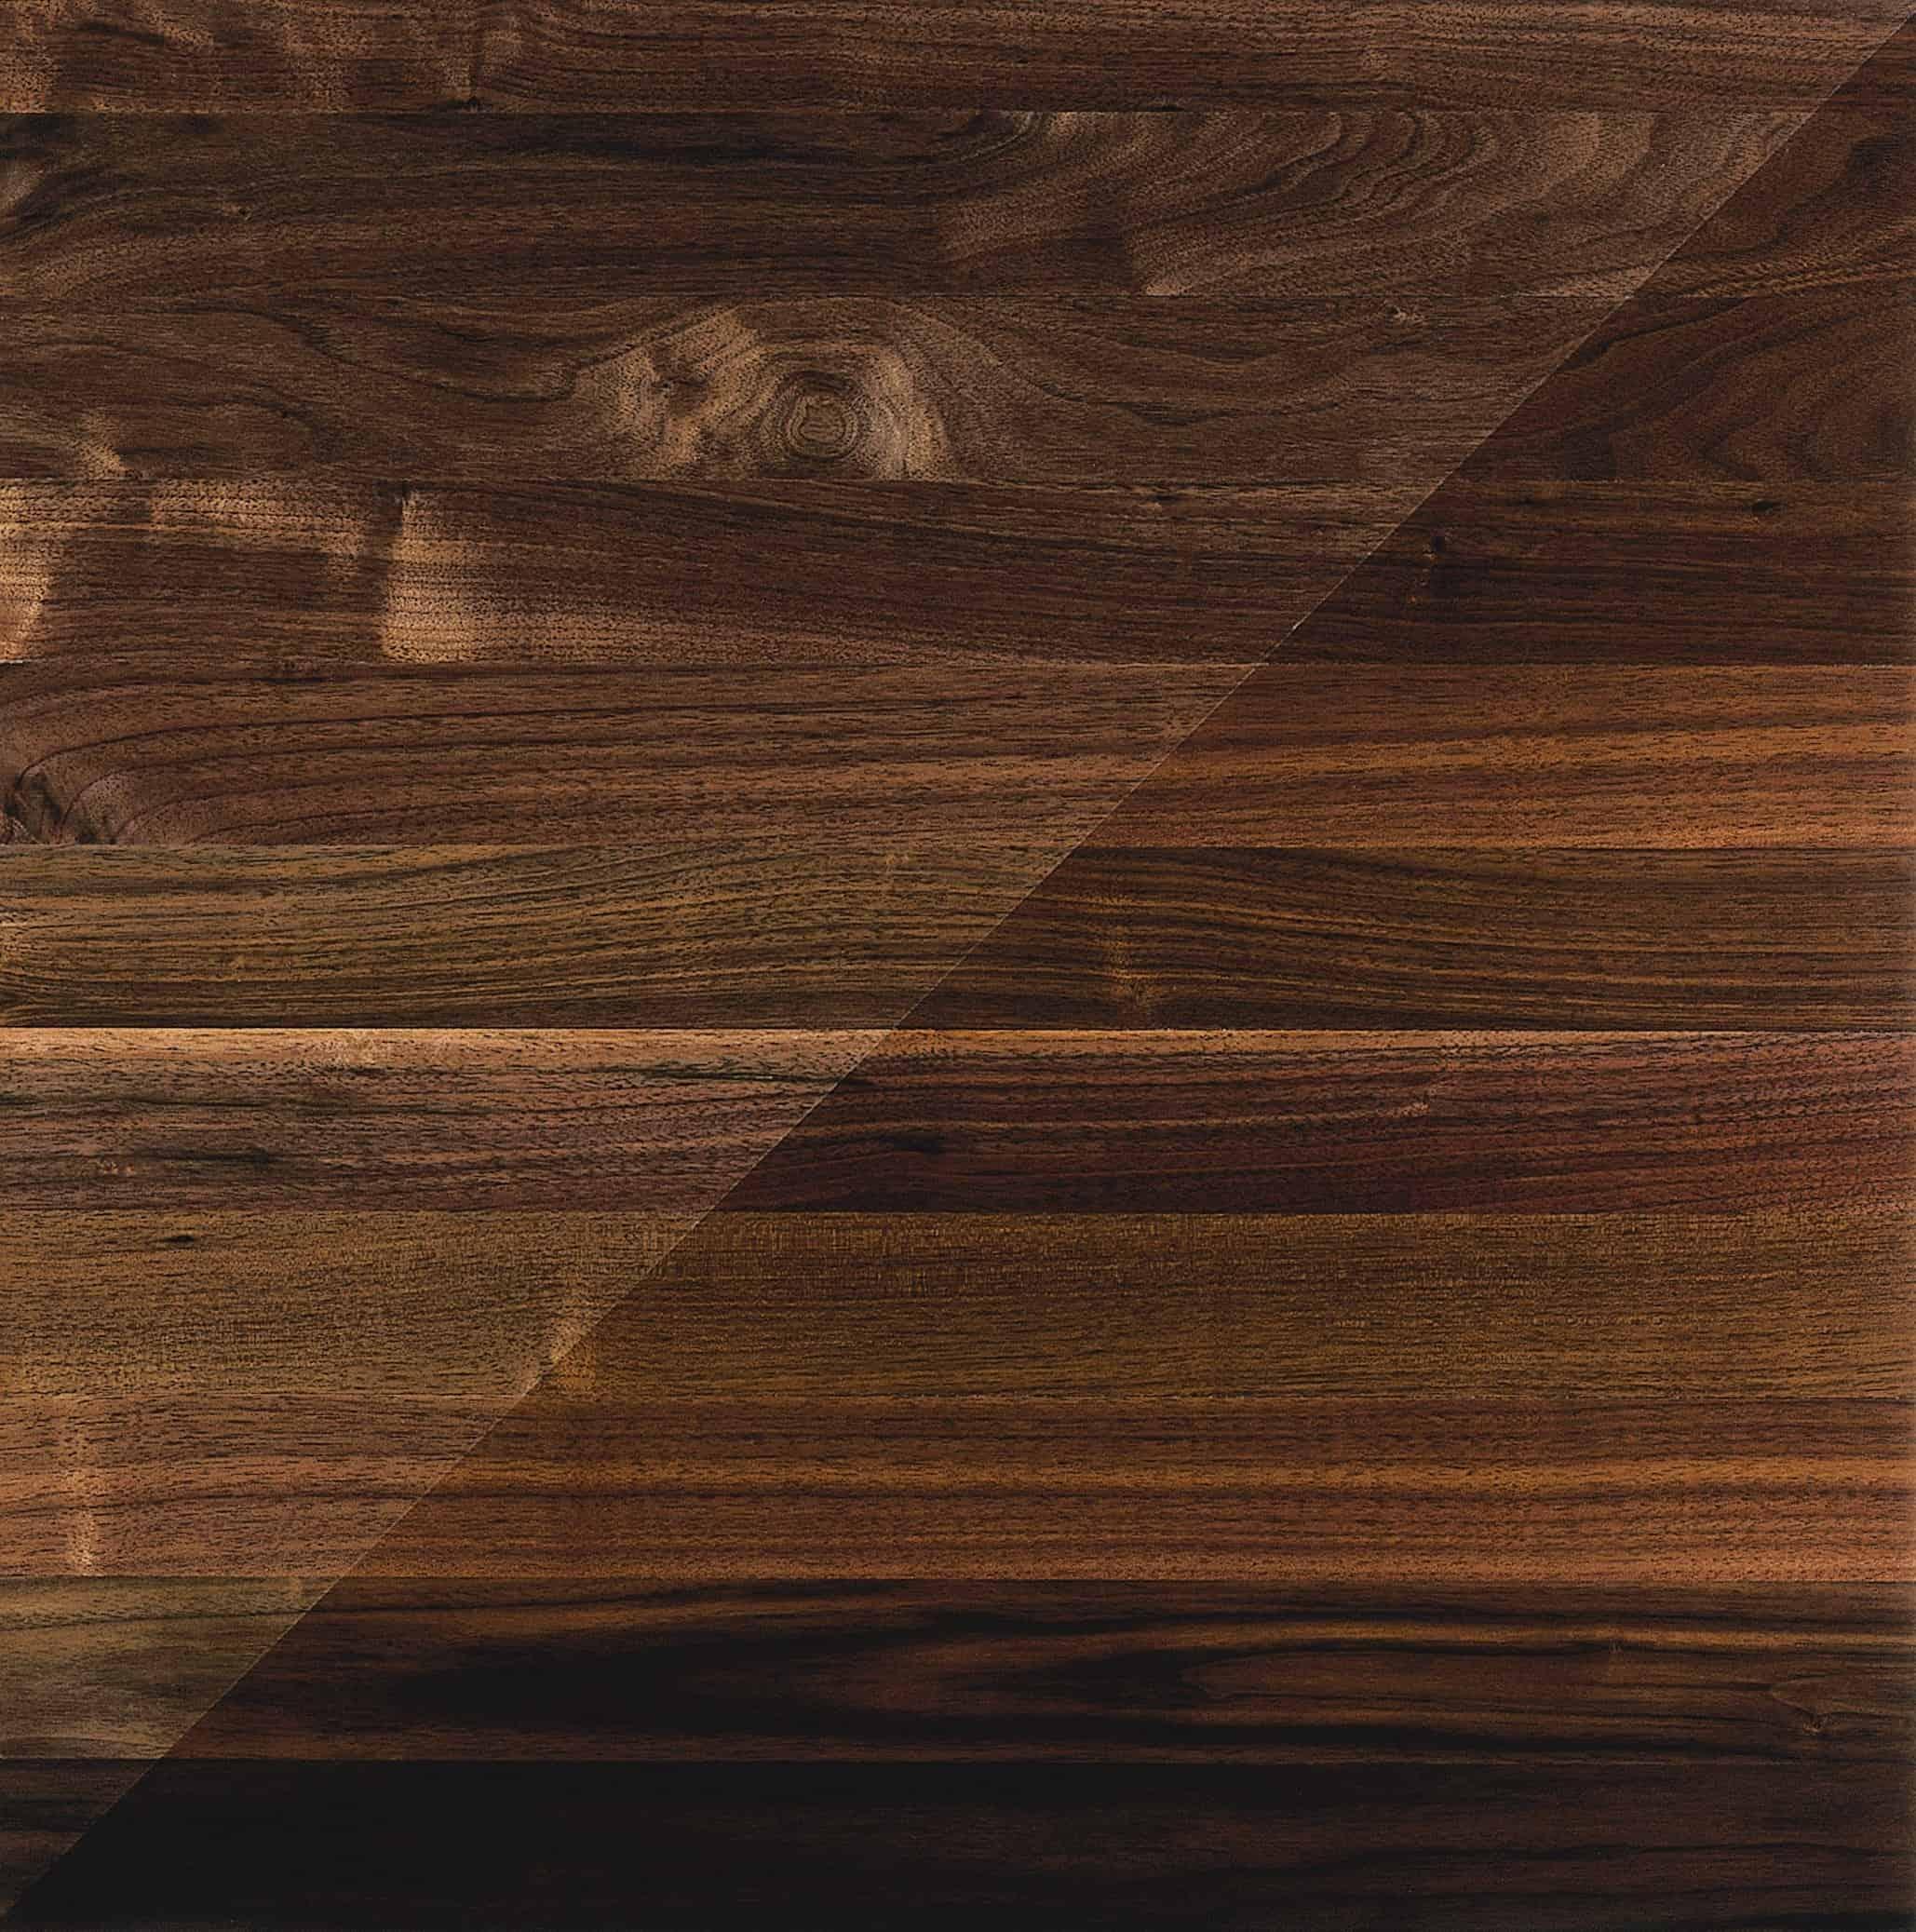 Species Specs Walnut Black American Hardwood Floors